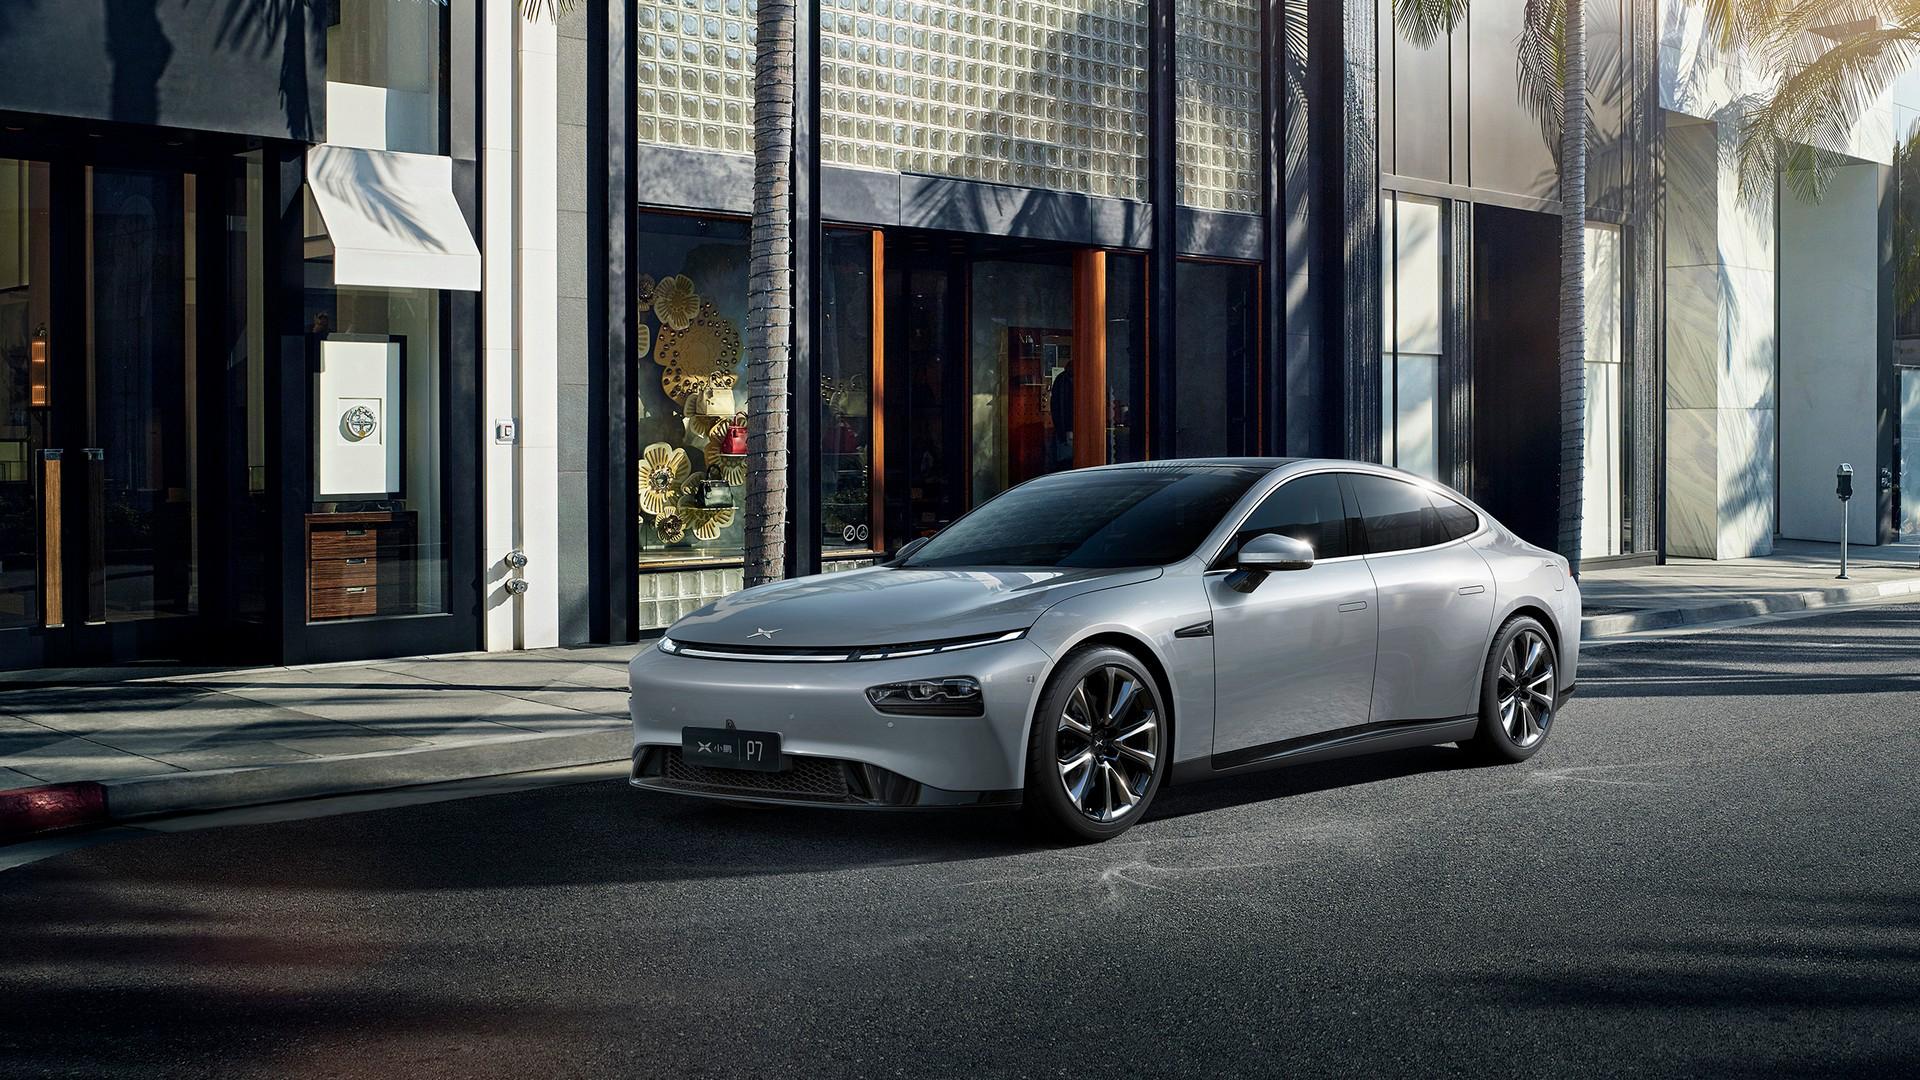 Eldrivna Xpeng P7 lanseras i Kina En utmanare till Tesla Model 3